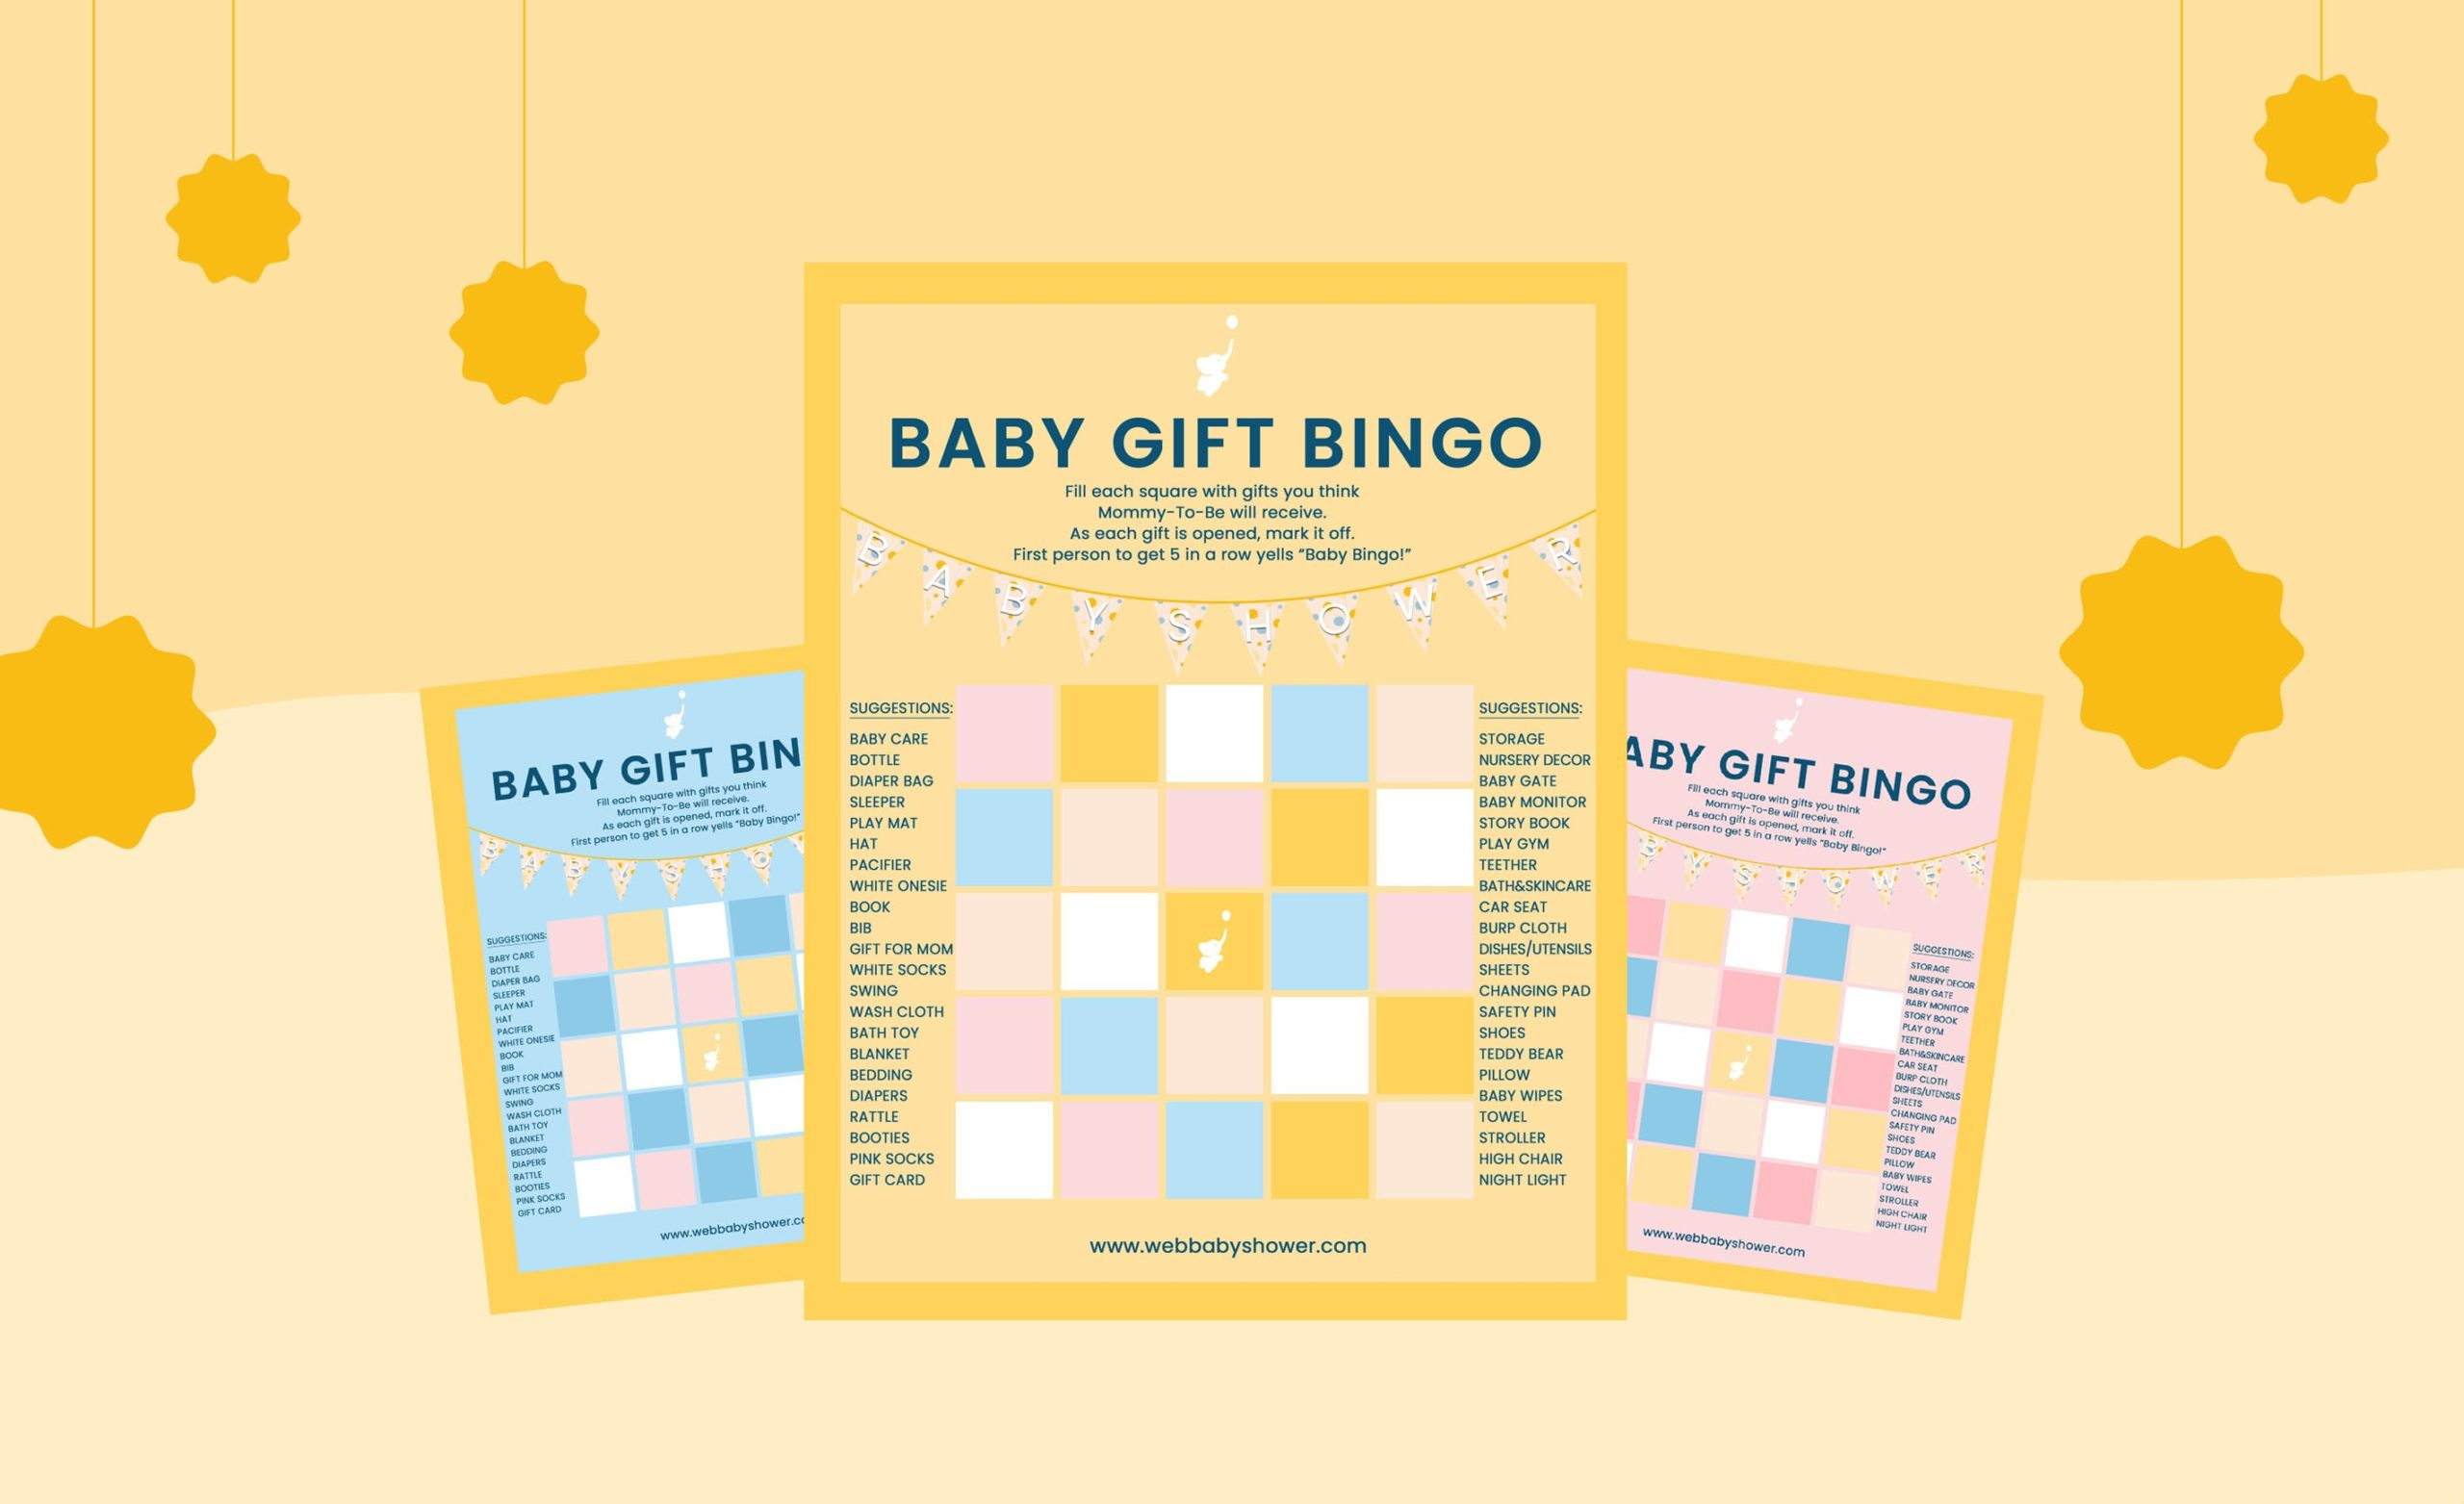 WebBabyShower Bingo Games Header Image